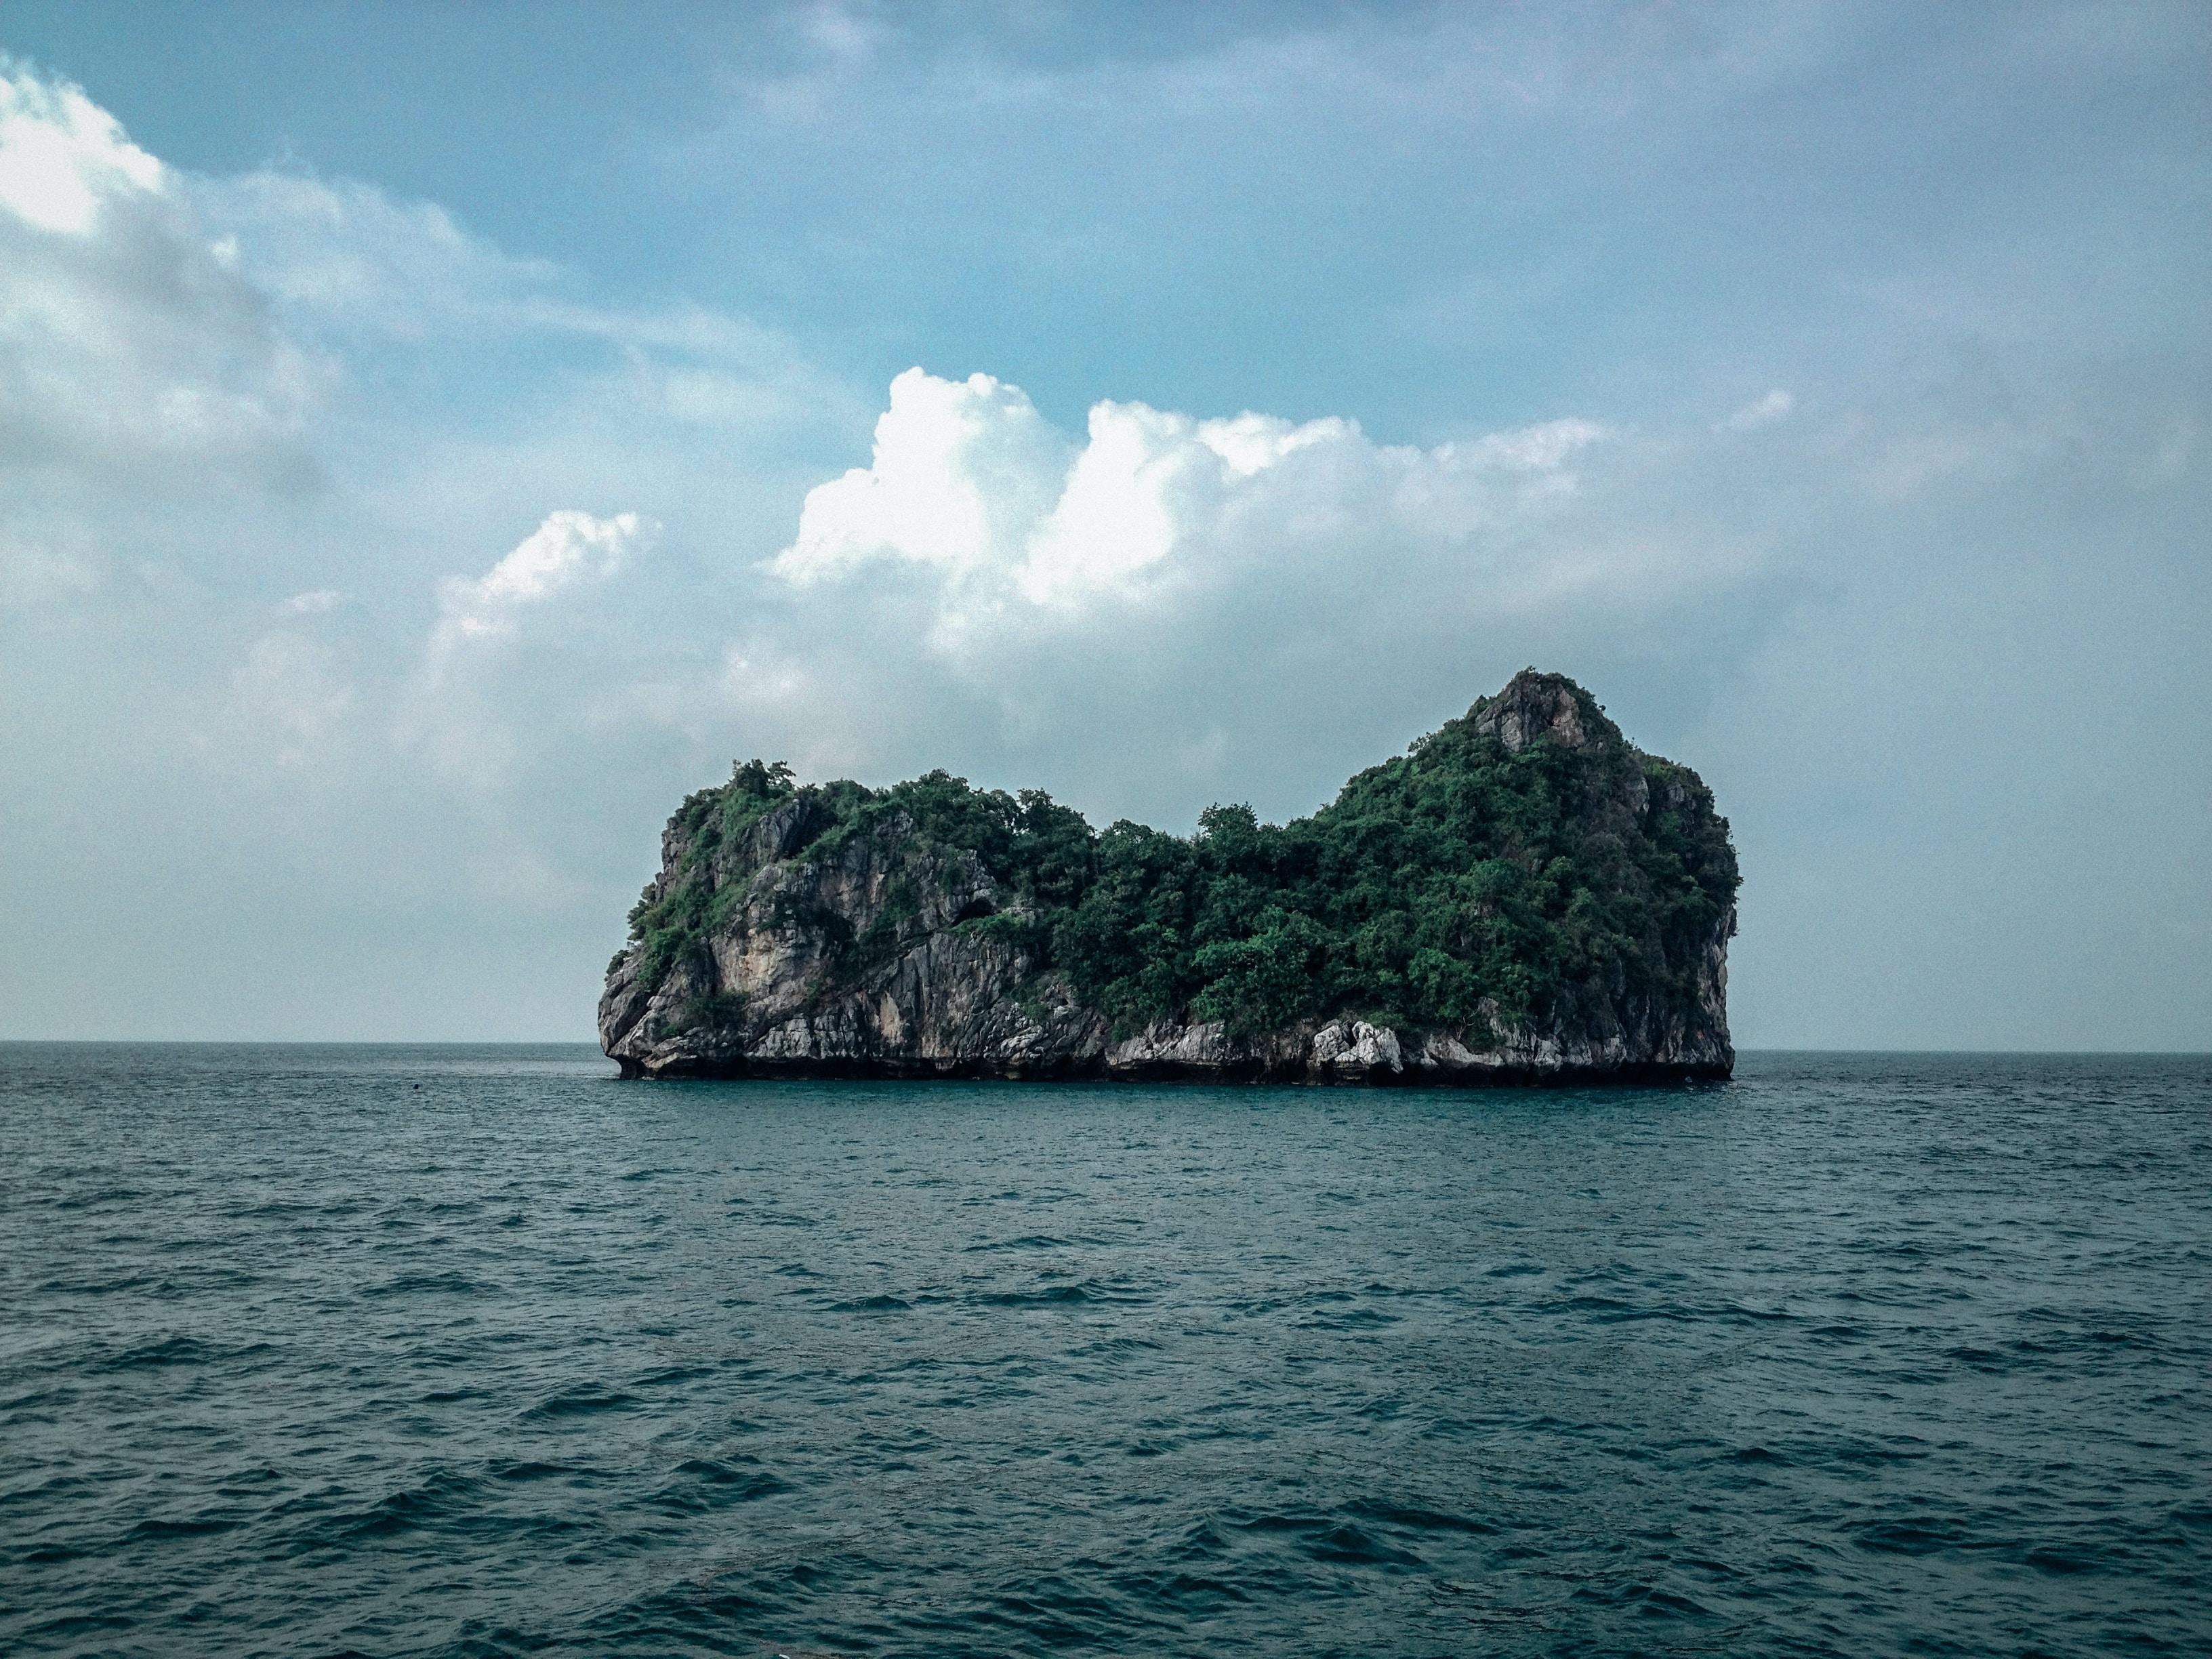 island with trees on sea under gray sky